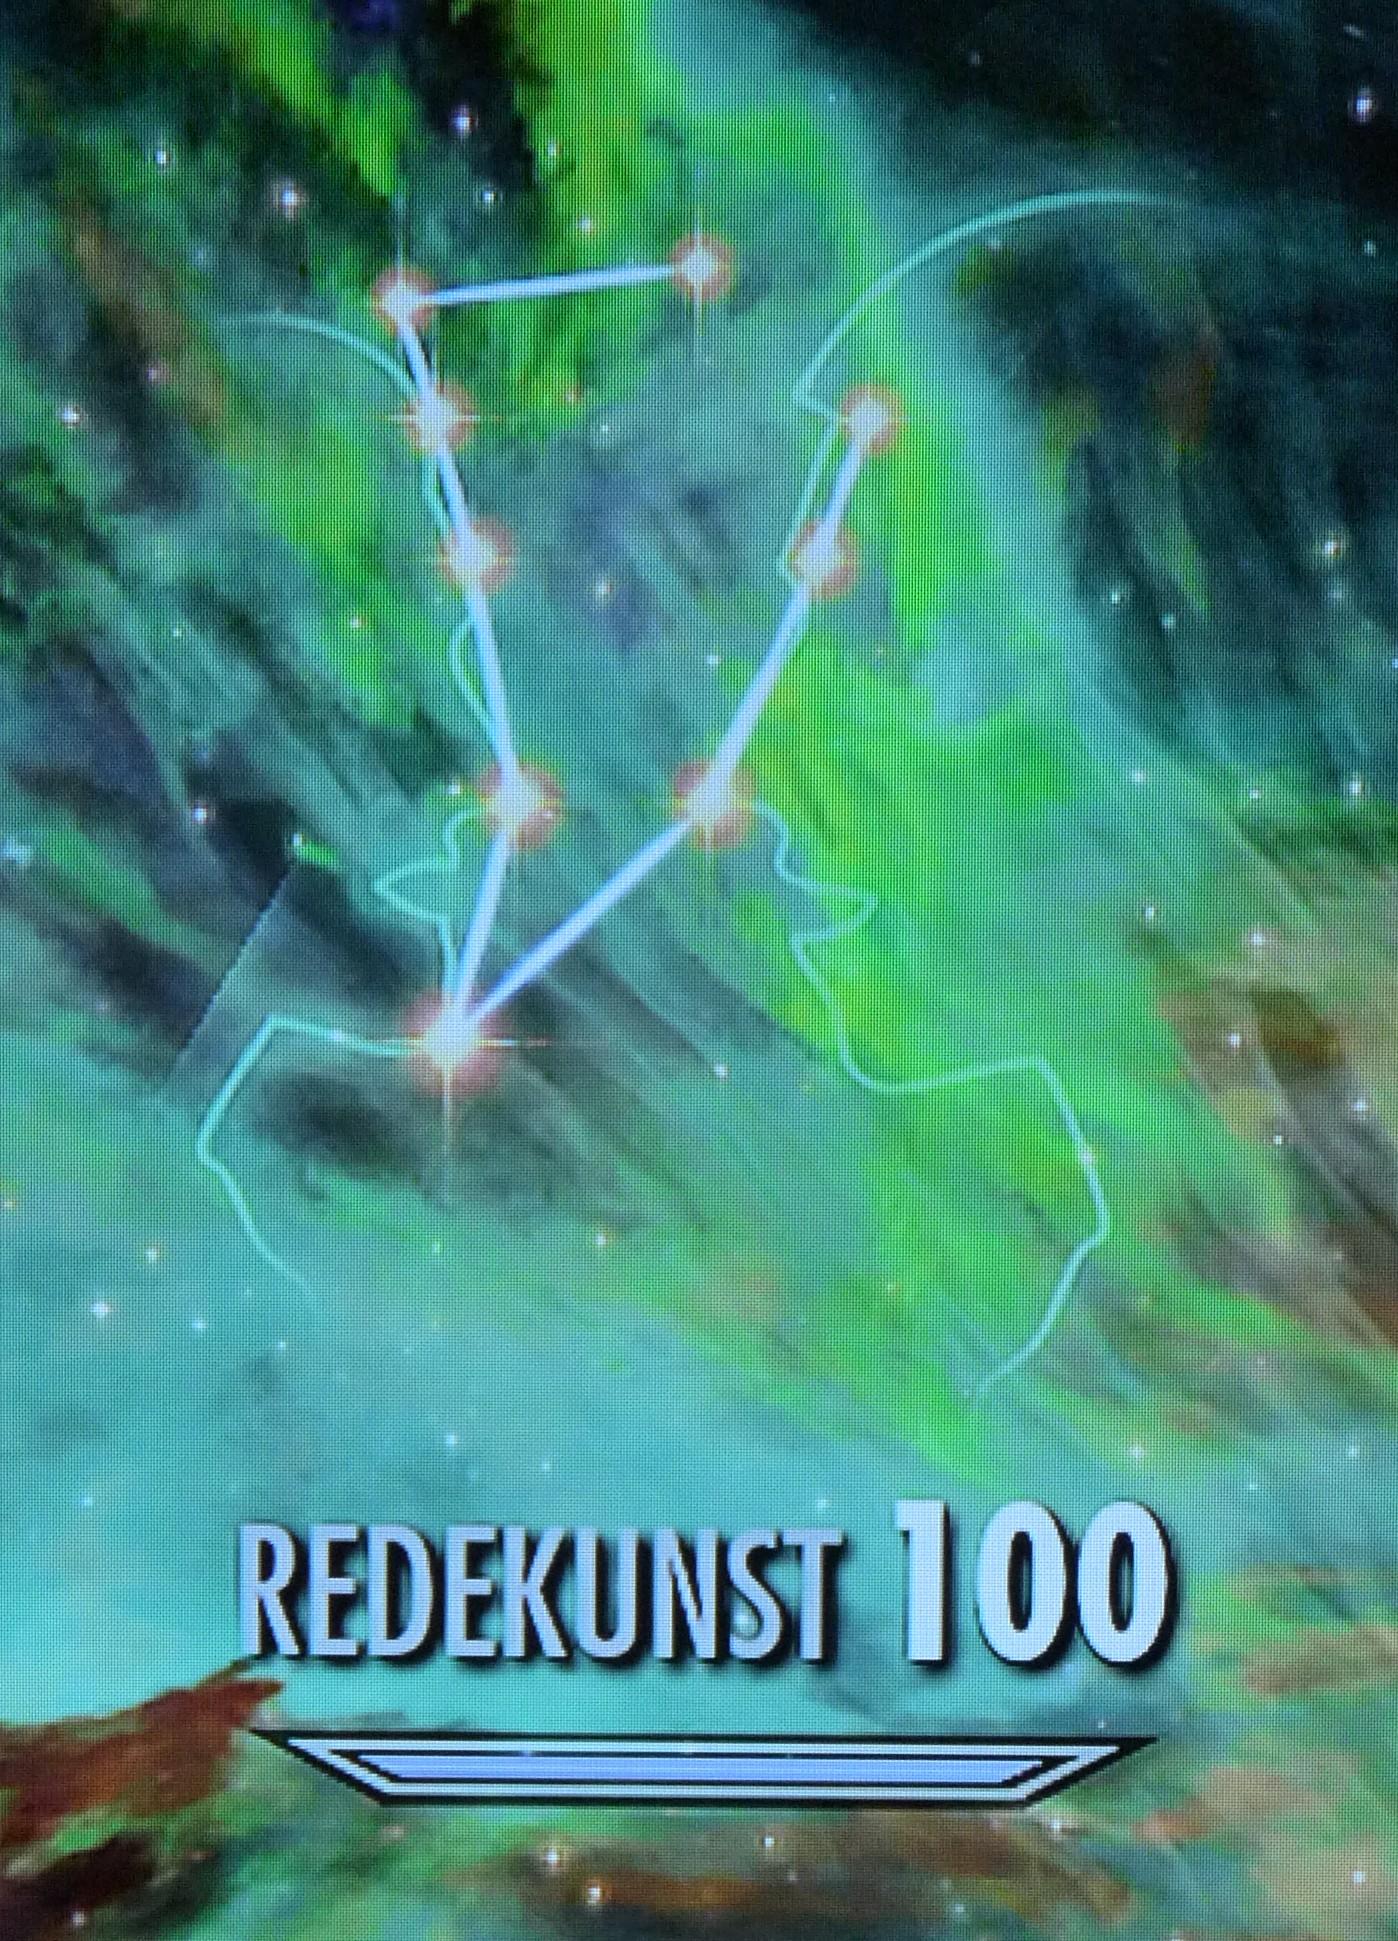 Redekunst | Elder Scrolls Wiki | FANDOM powered by Wikia